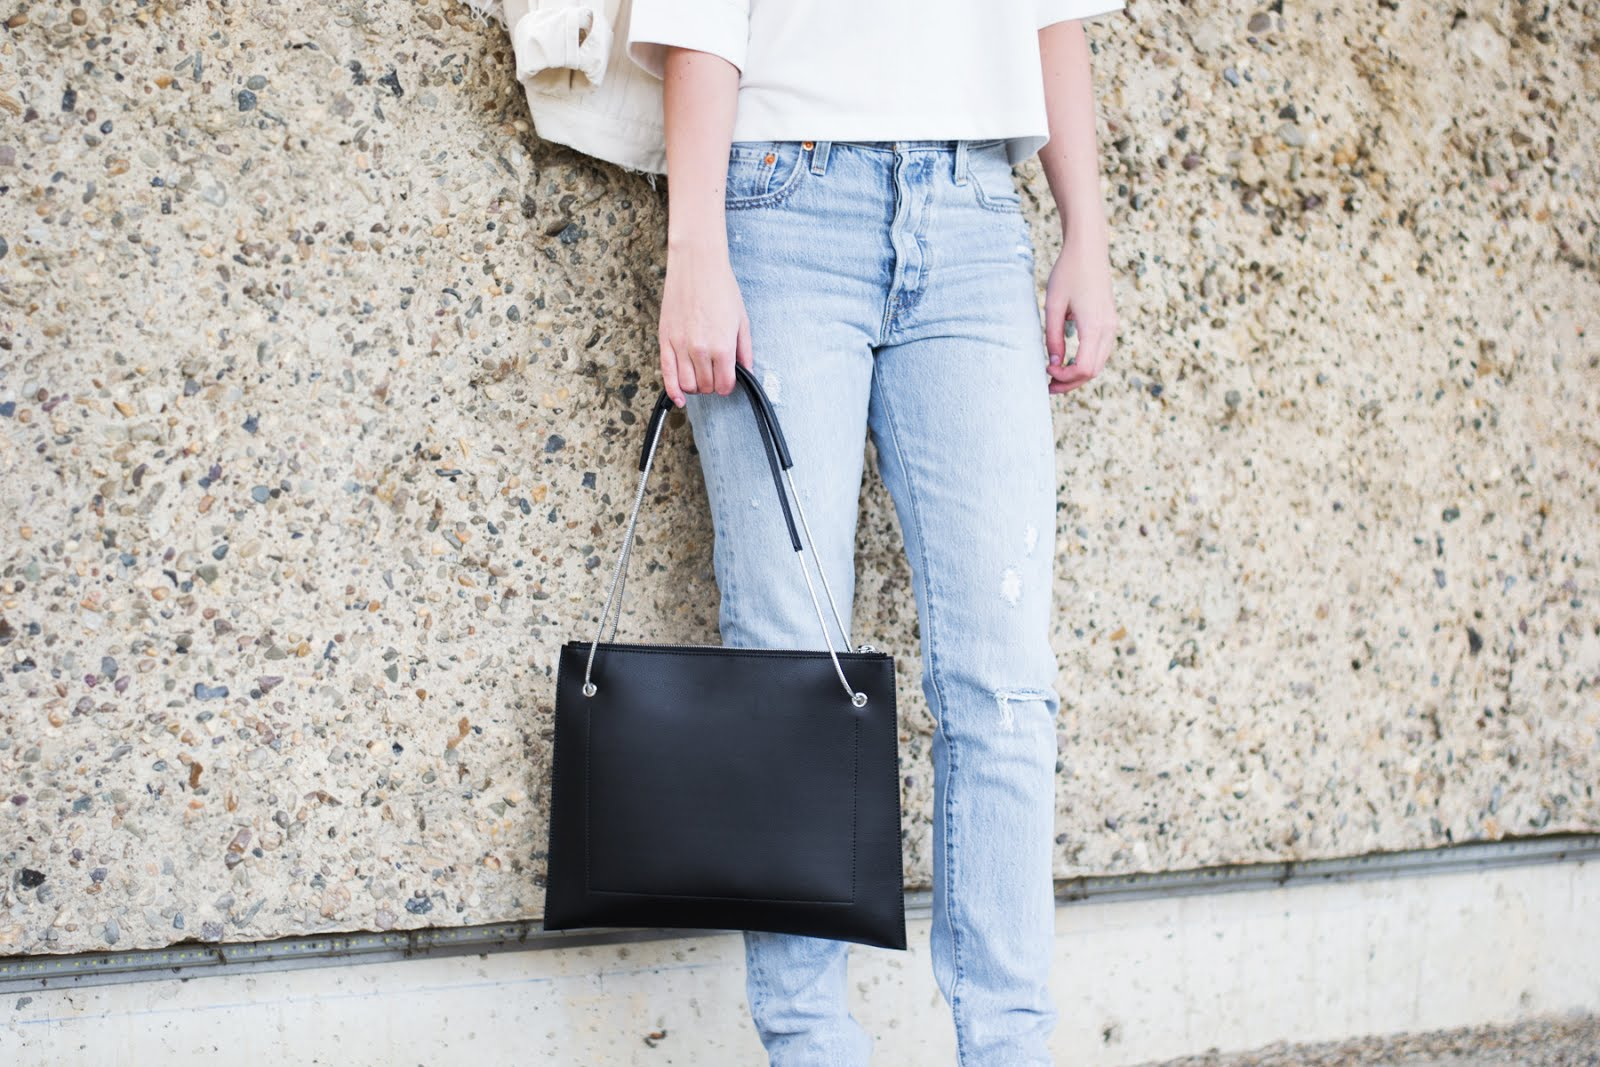 levi's vintage 501 Skinny jeans, Flippa k bag, SS17, zalando, outfit, vroenhoven, minimal